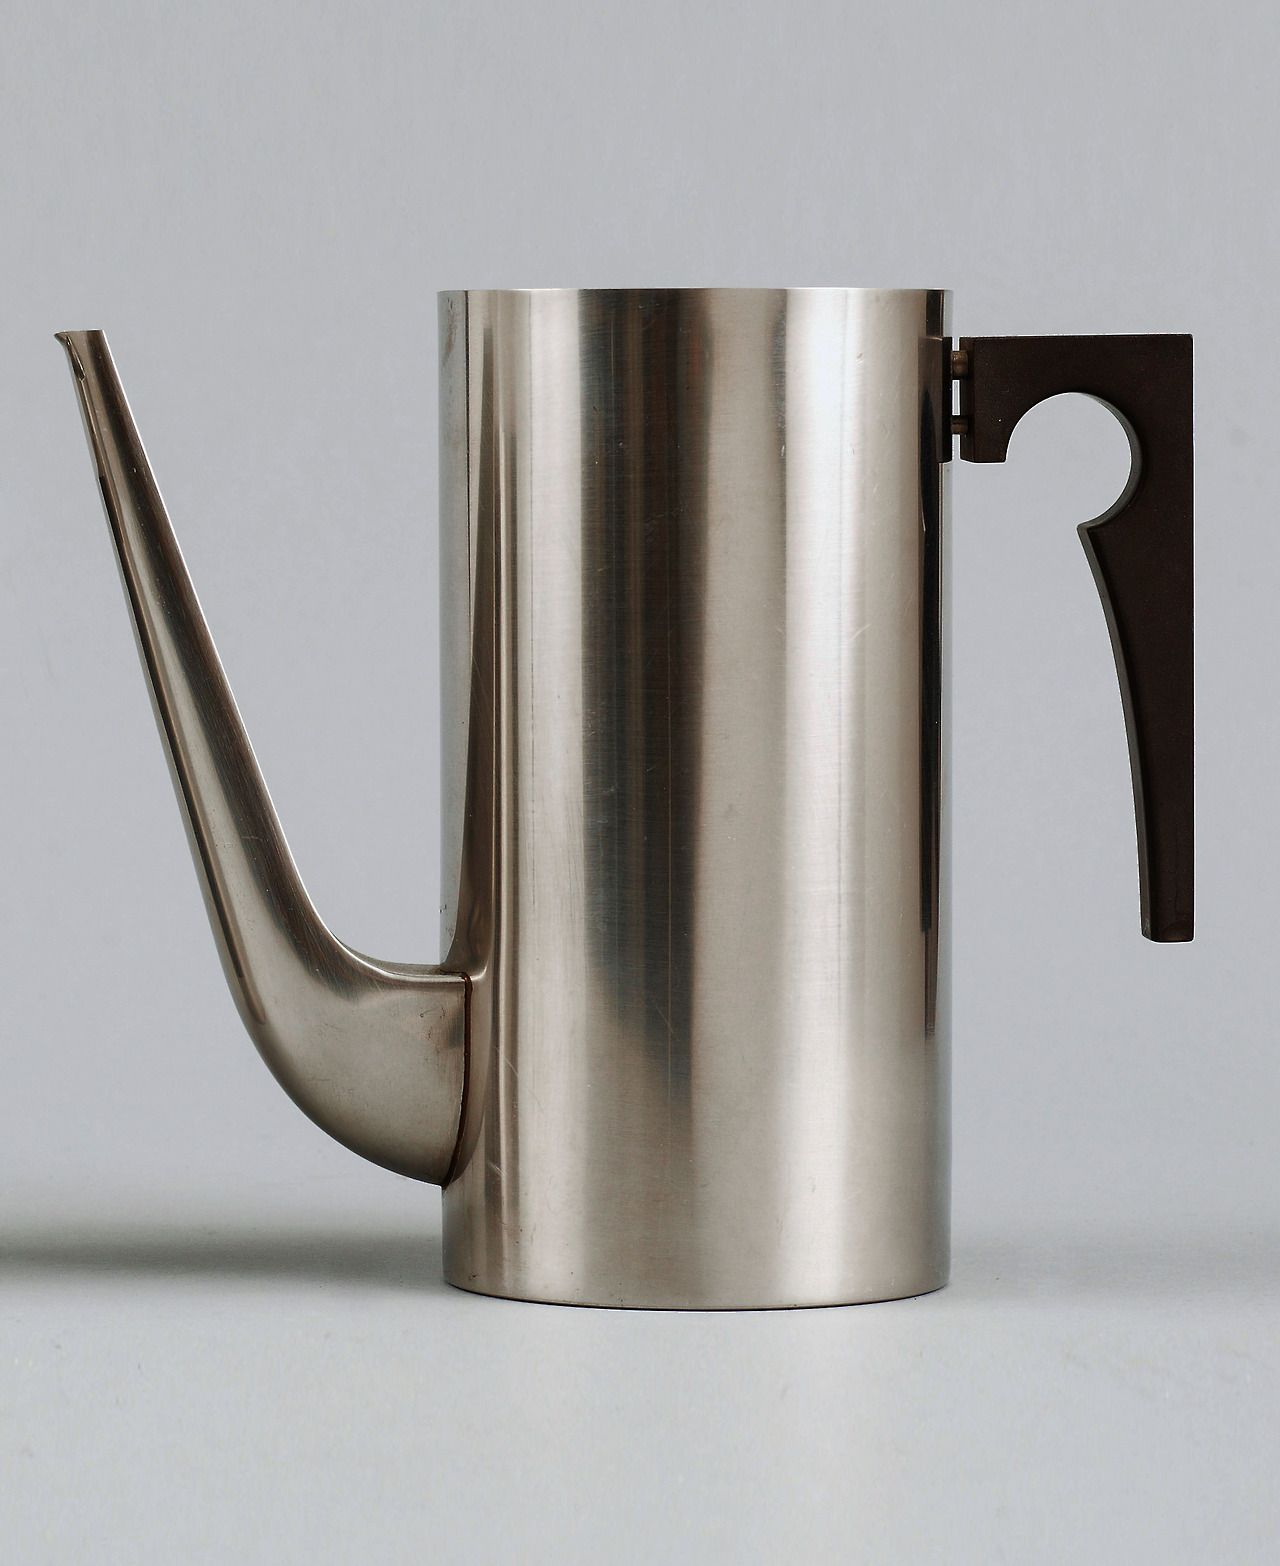 Bauhaus pendant lamp marianne brandt and hans przyrembel 1925 - Arne Jacobsen A Coffee Pot For The Cylinda Line Serie By Stelton Denmark